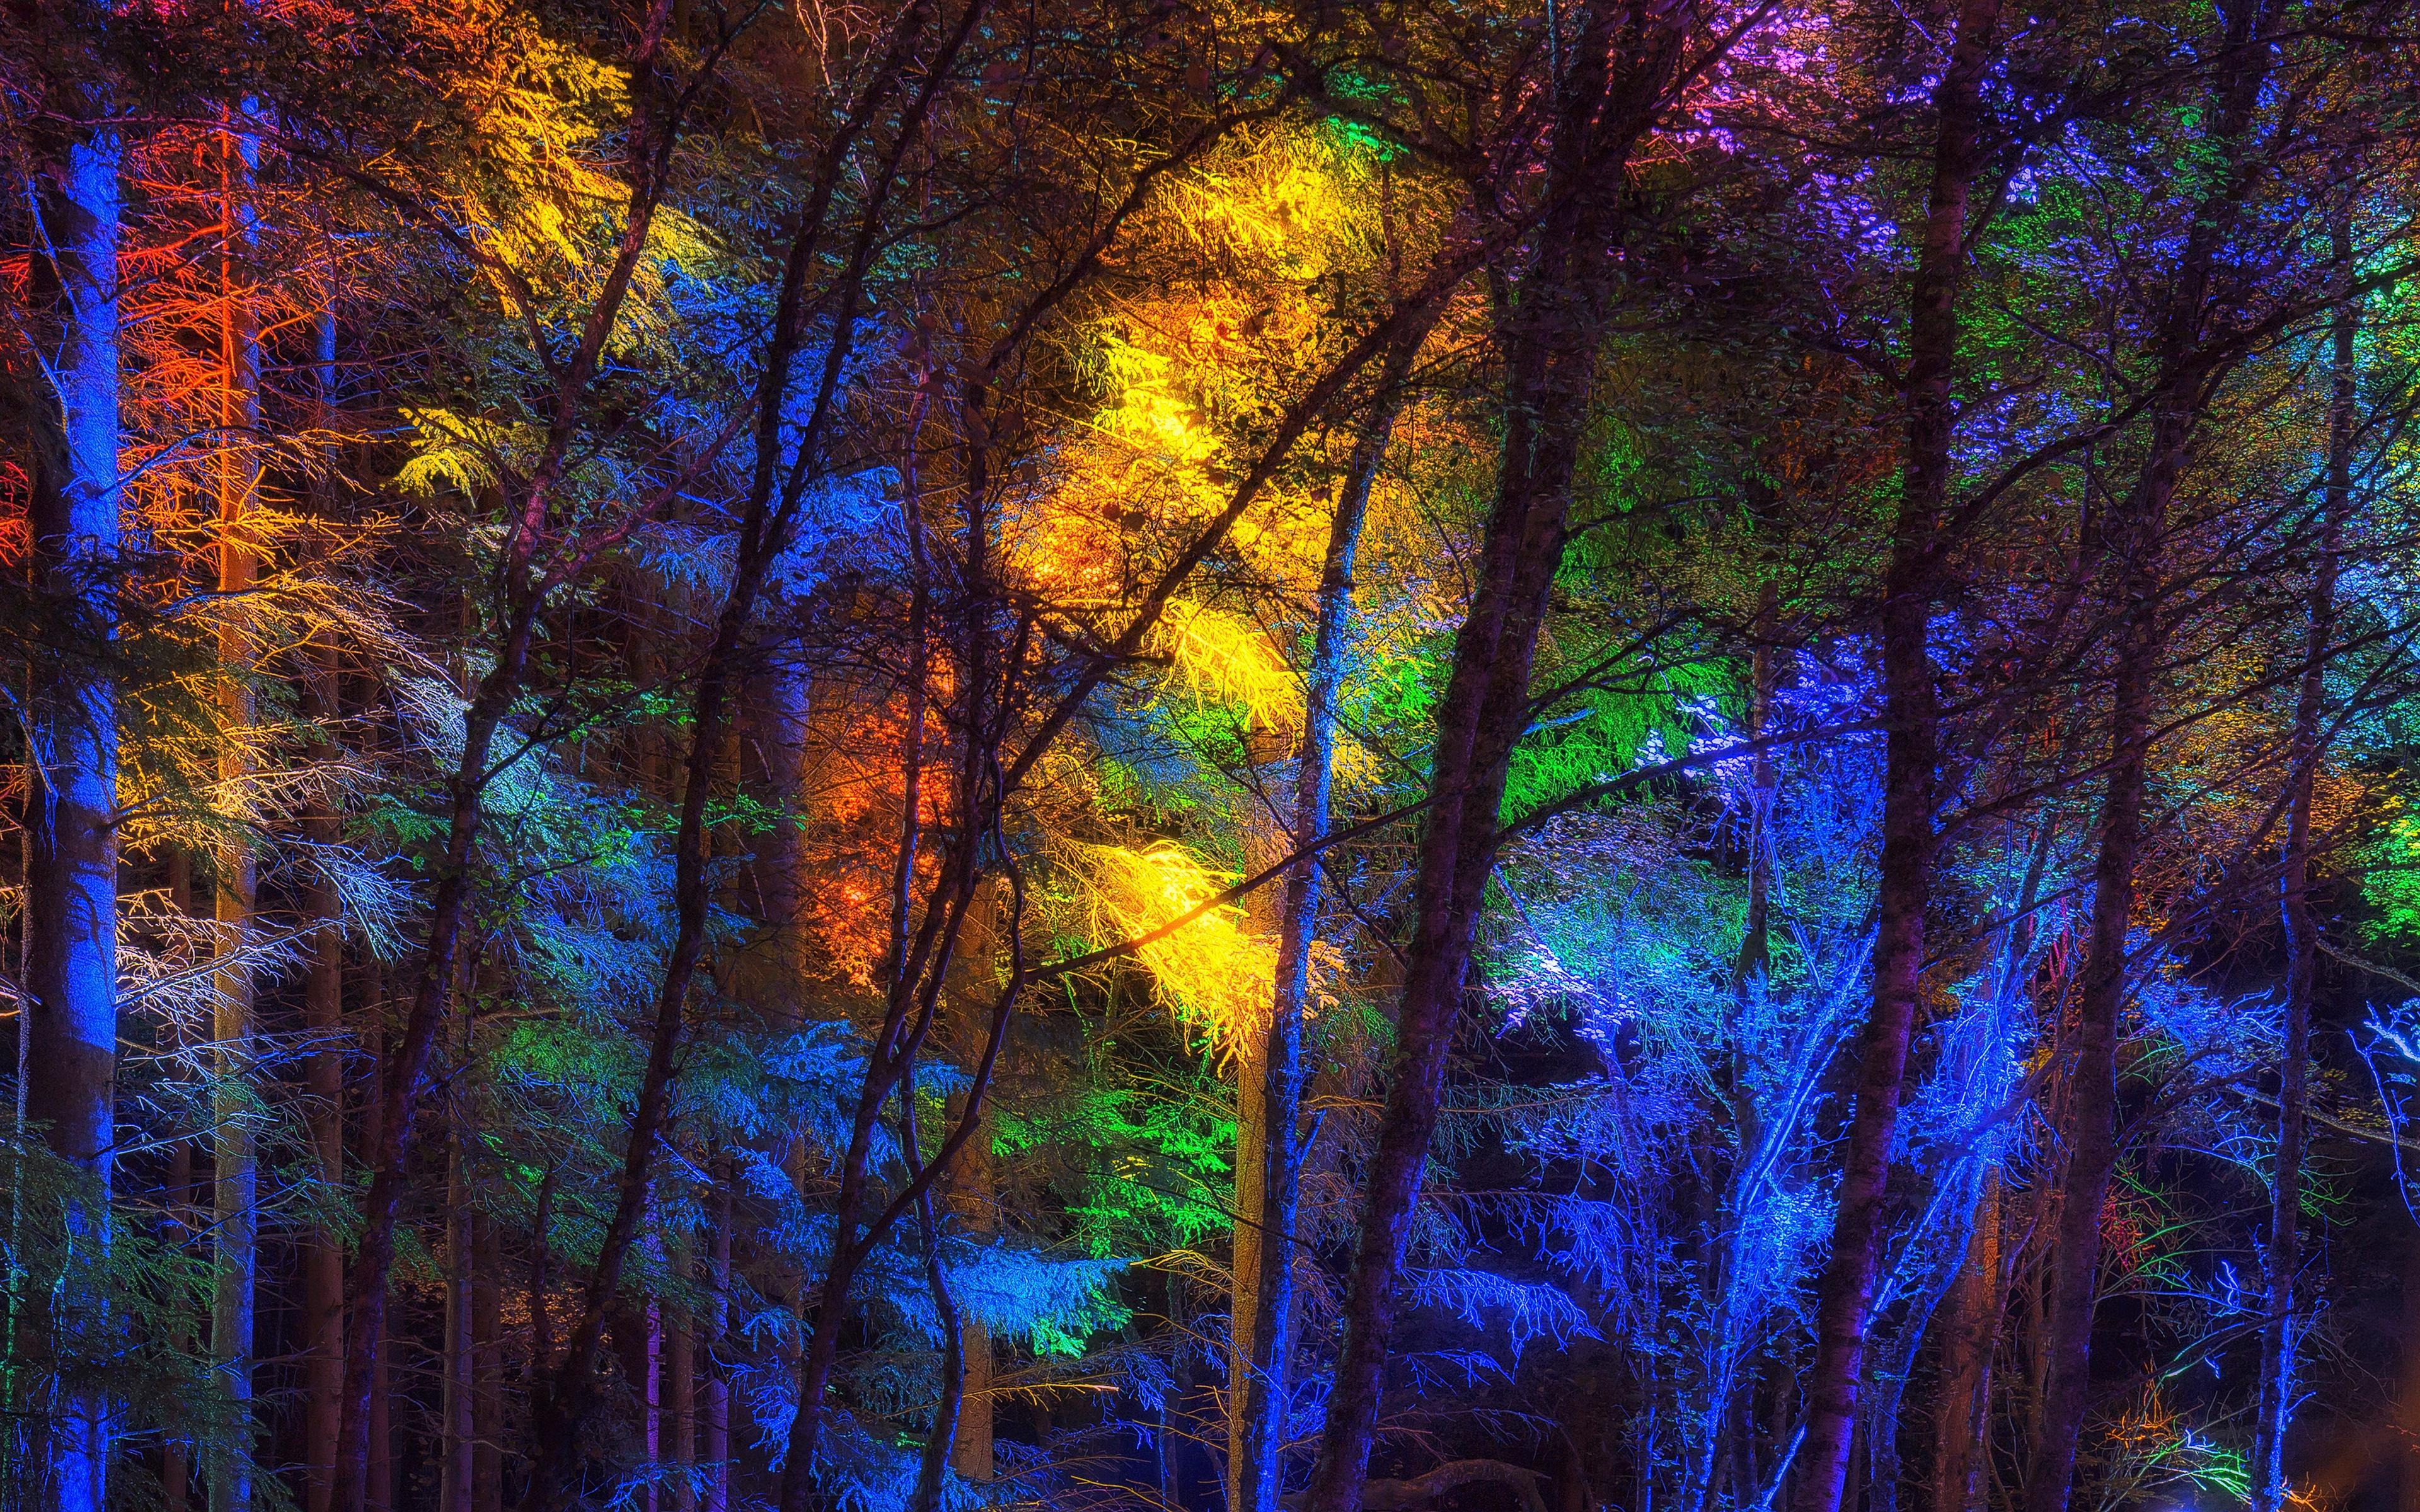 4k Colorful Landscape Wallpapers - Wallpaper Cave